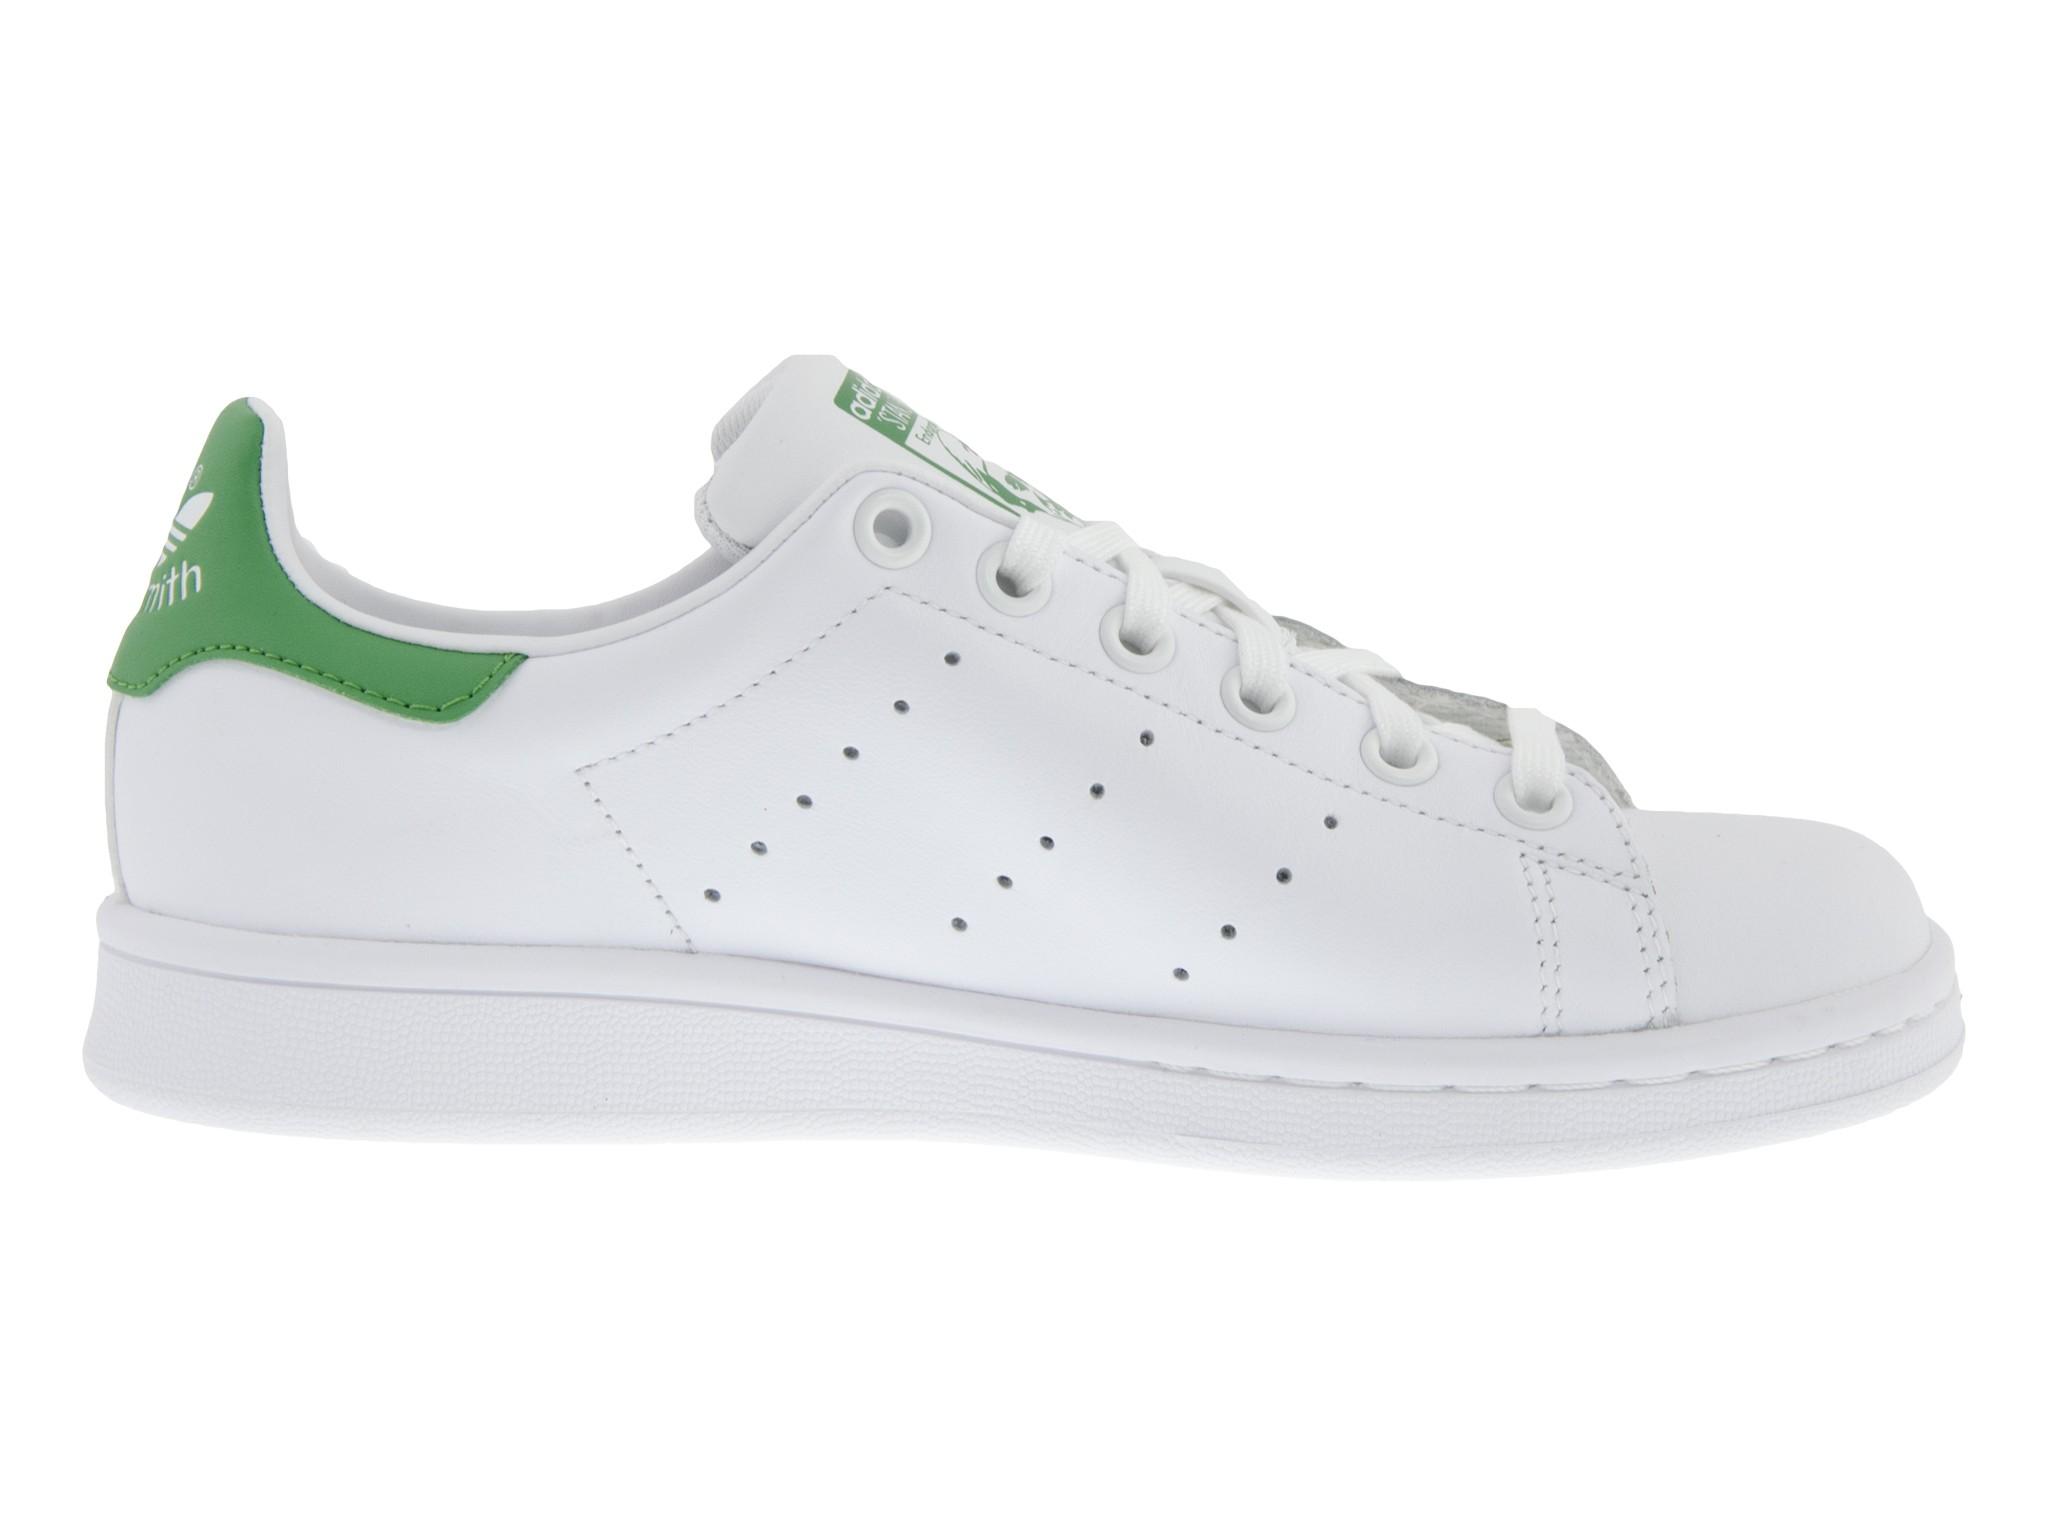 adidas basse bianche e verdi